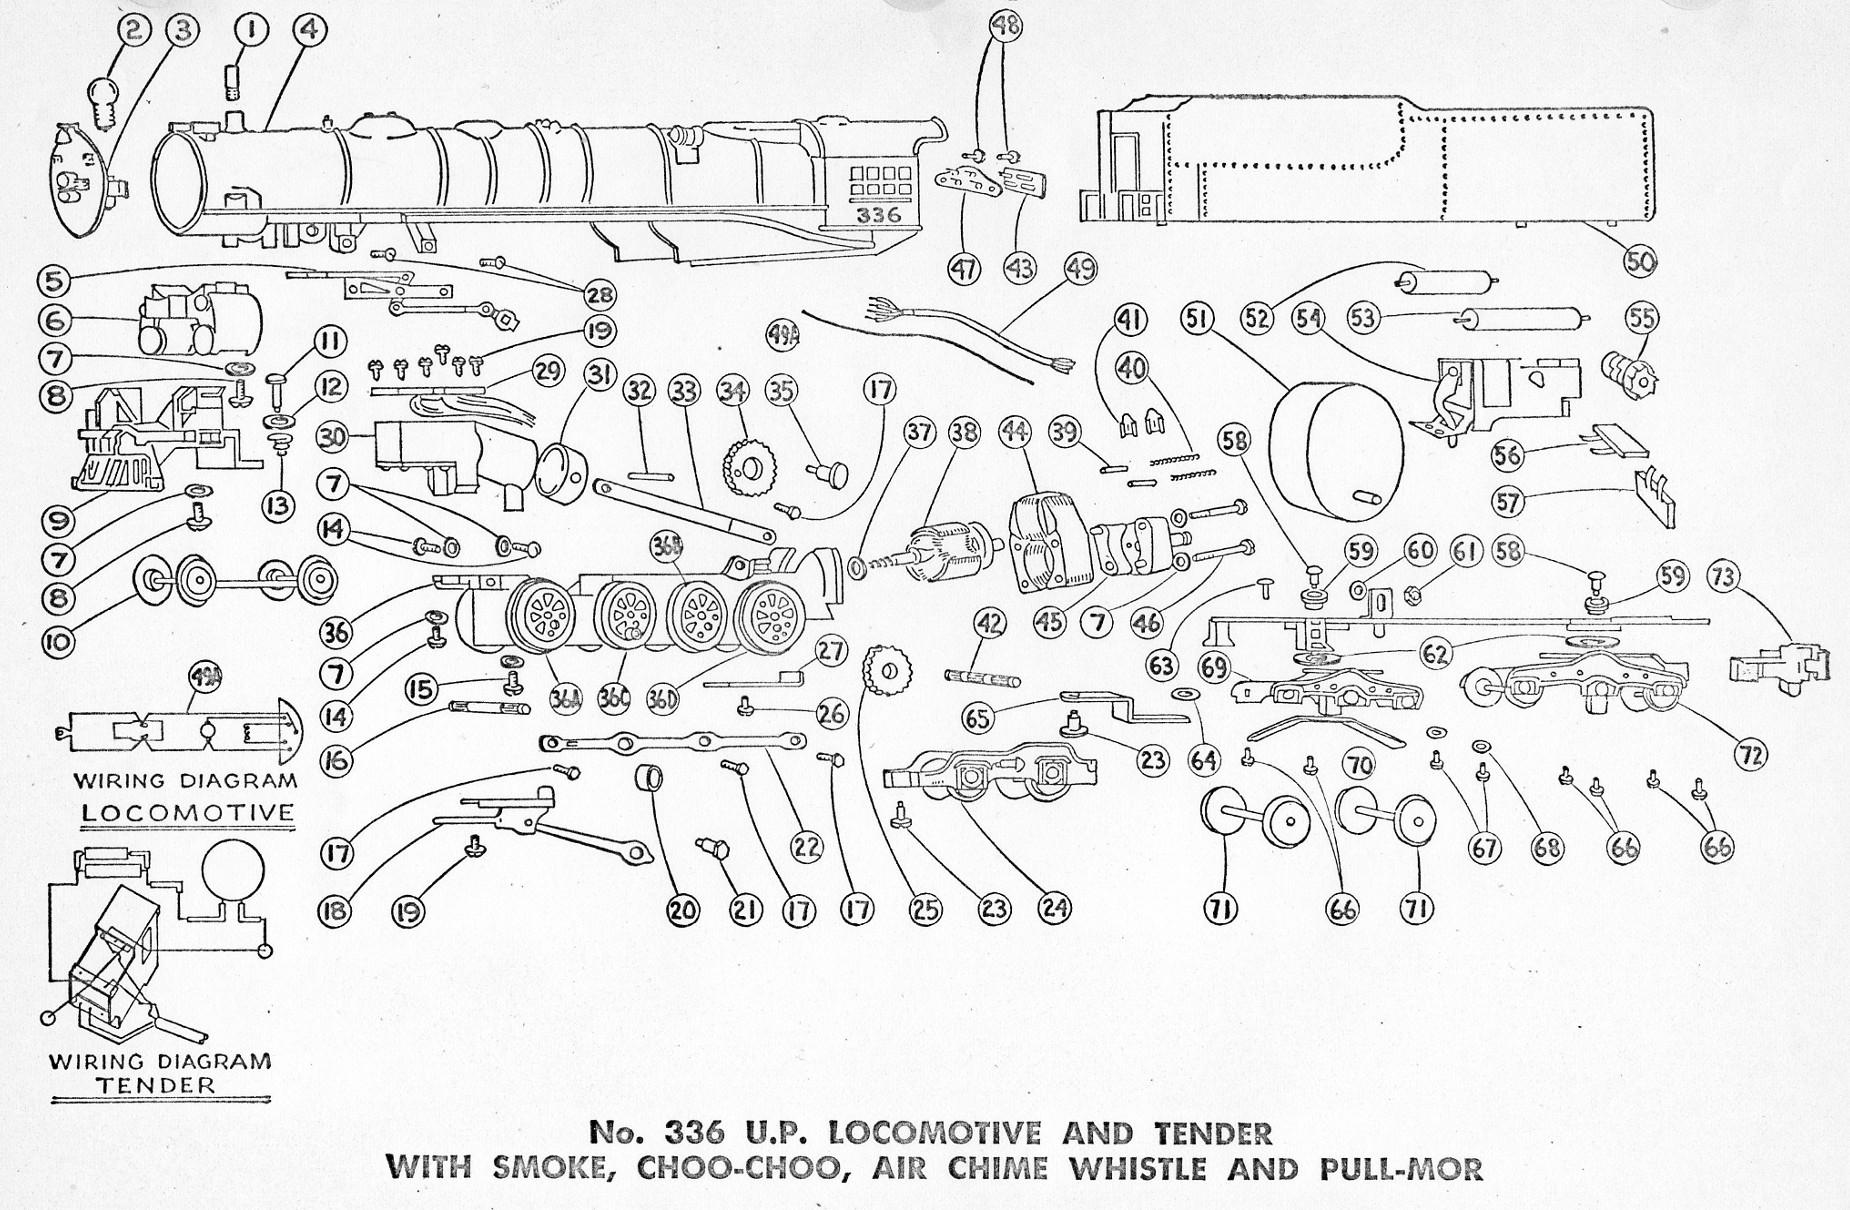 American Flyer Locomotive 336 Parts List Amp Diagram